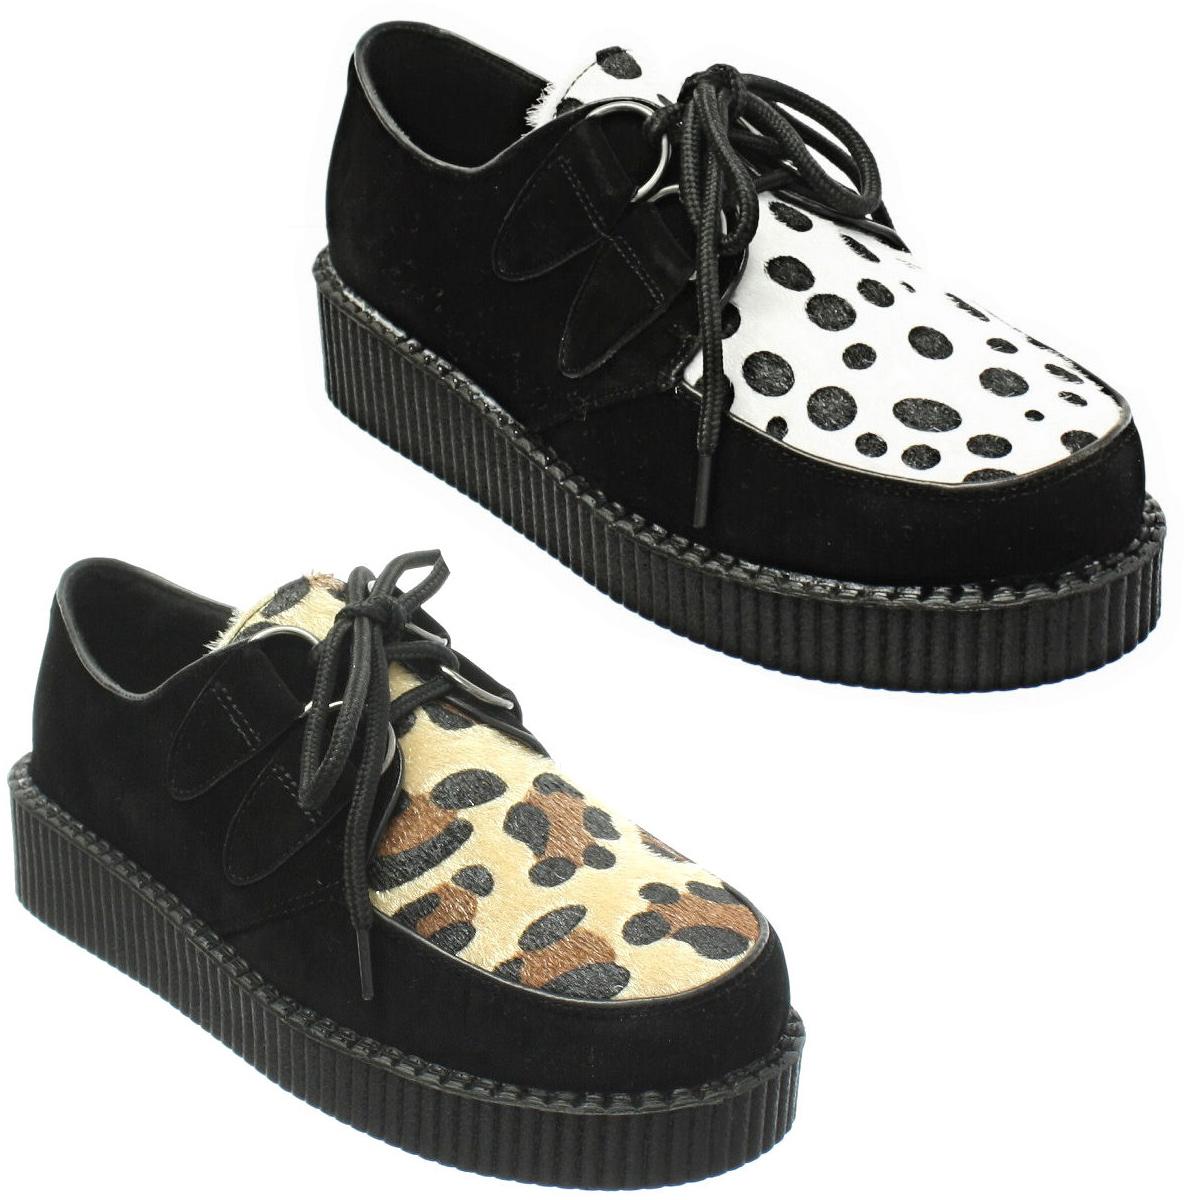 Dalmation Shoes Womens